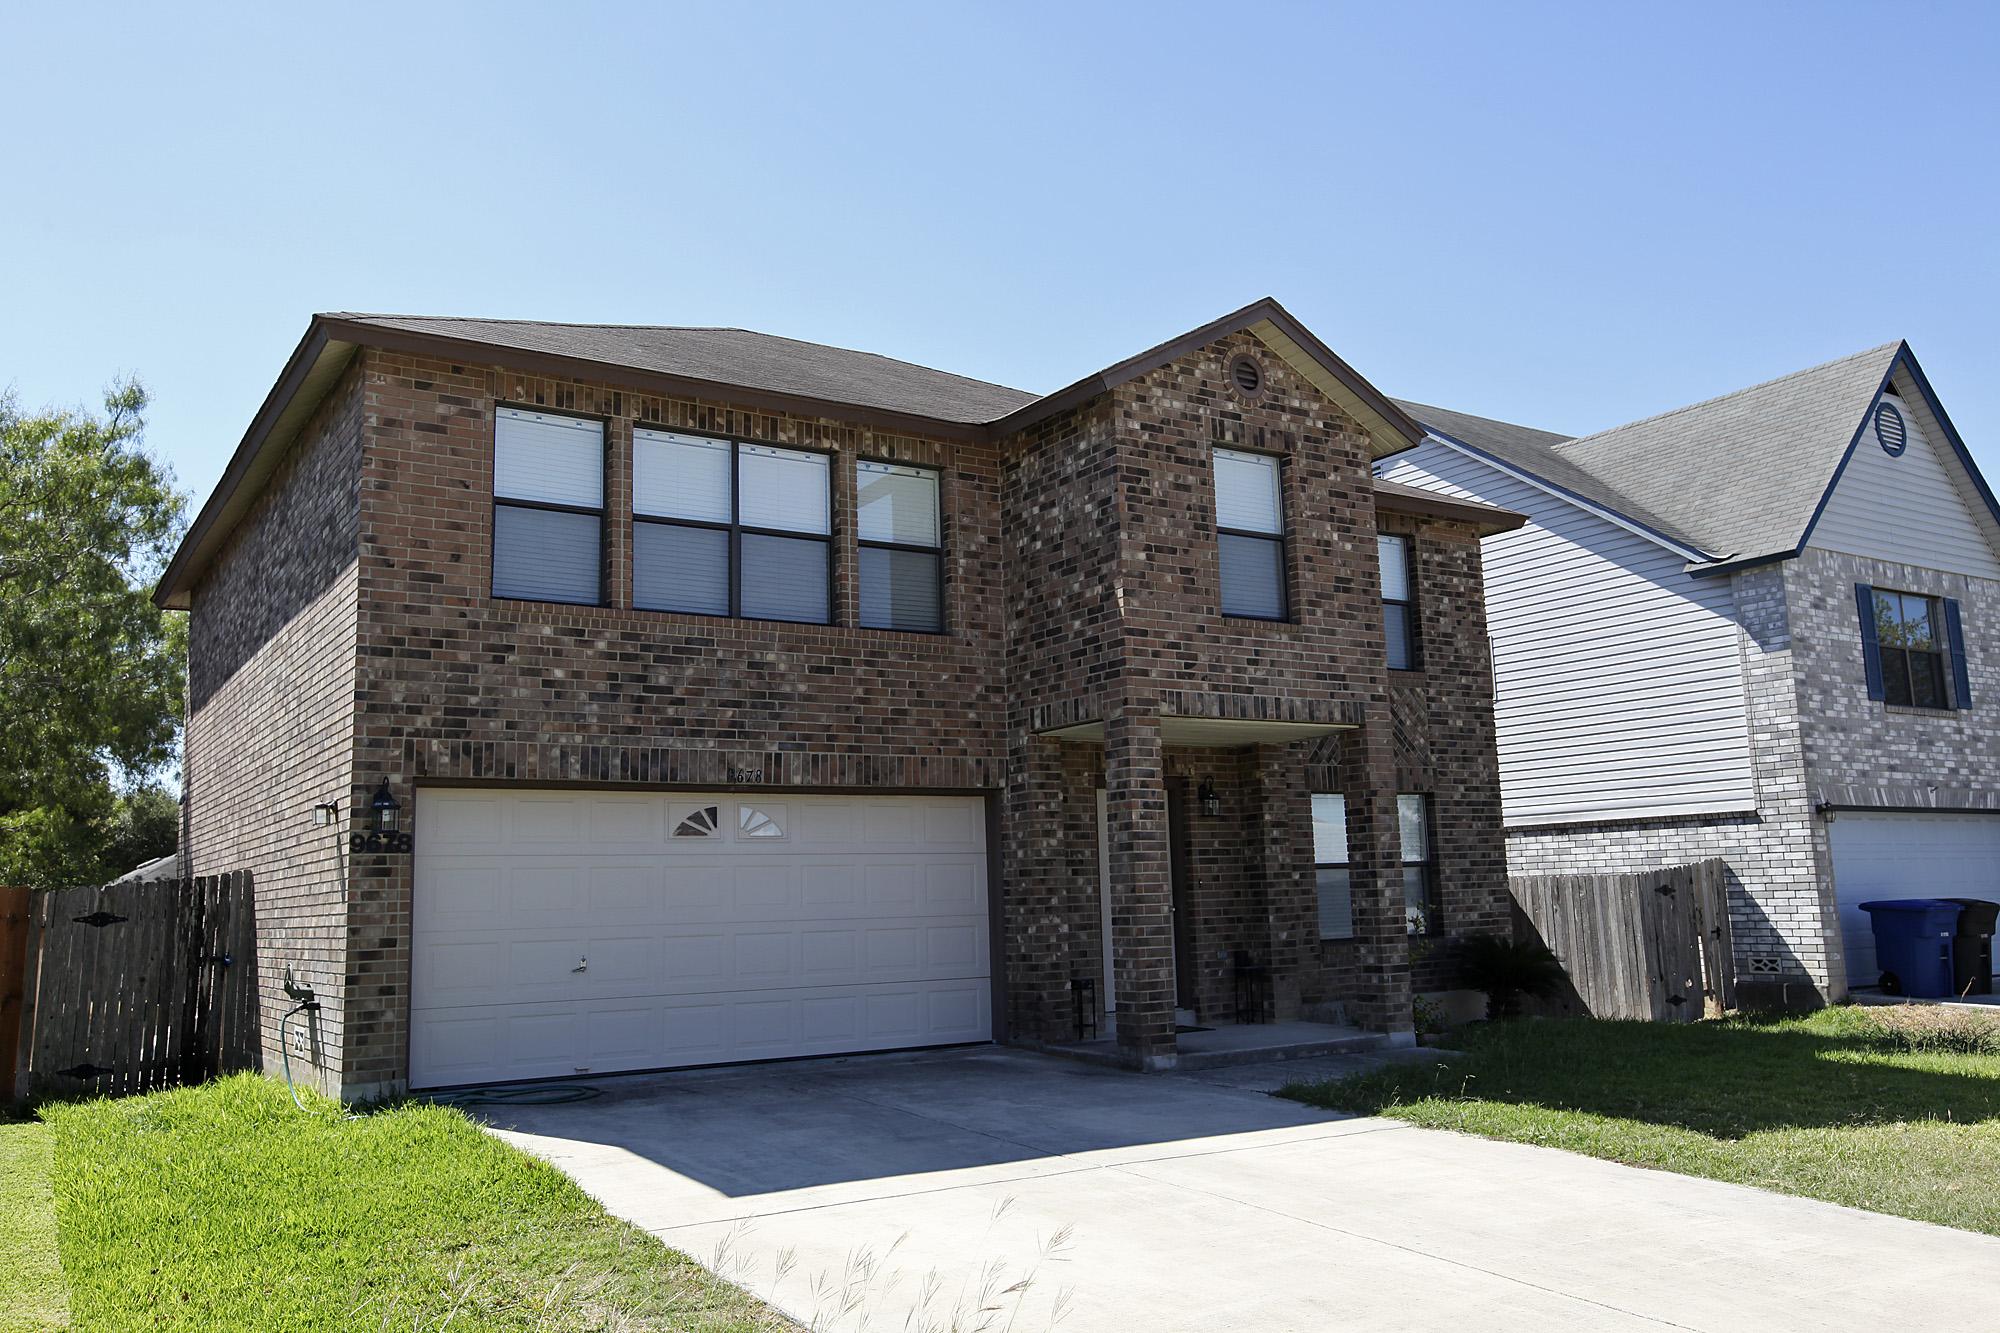 Mortgage error sparks lawsuit - San Antonio Express-News